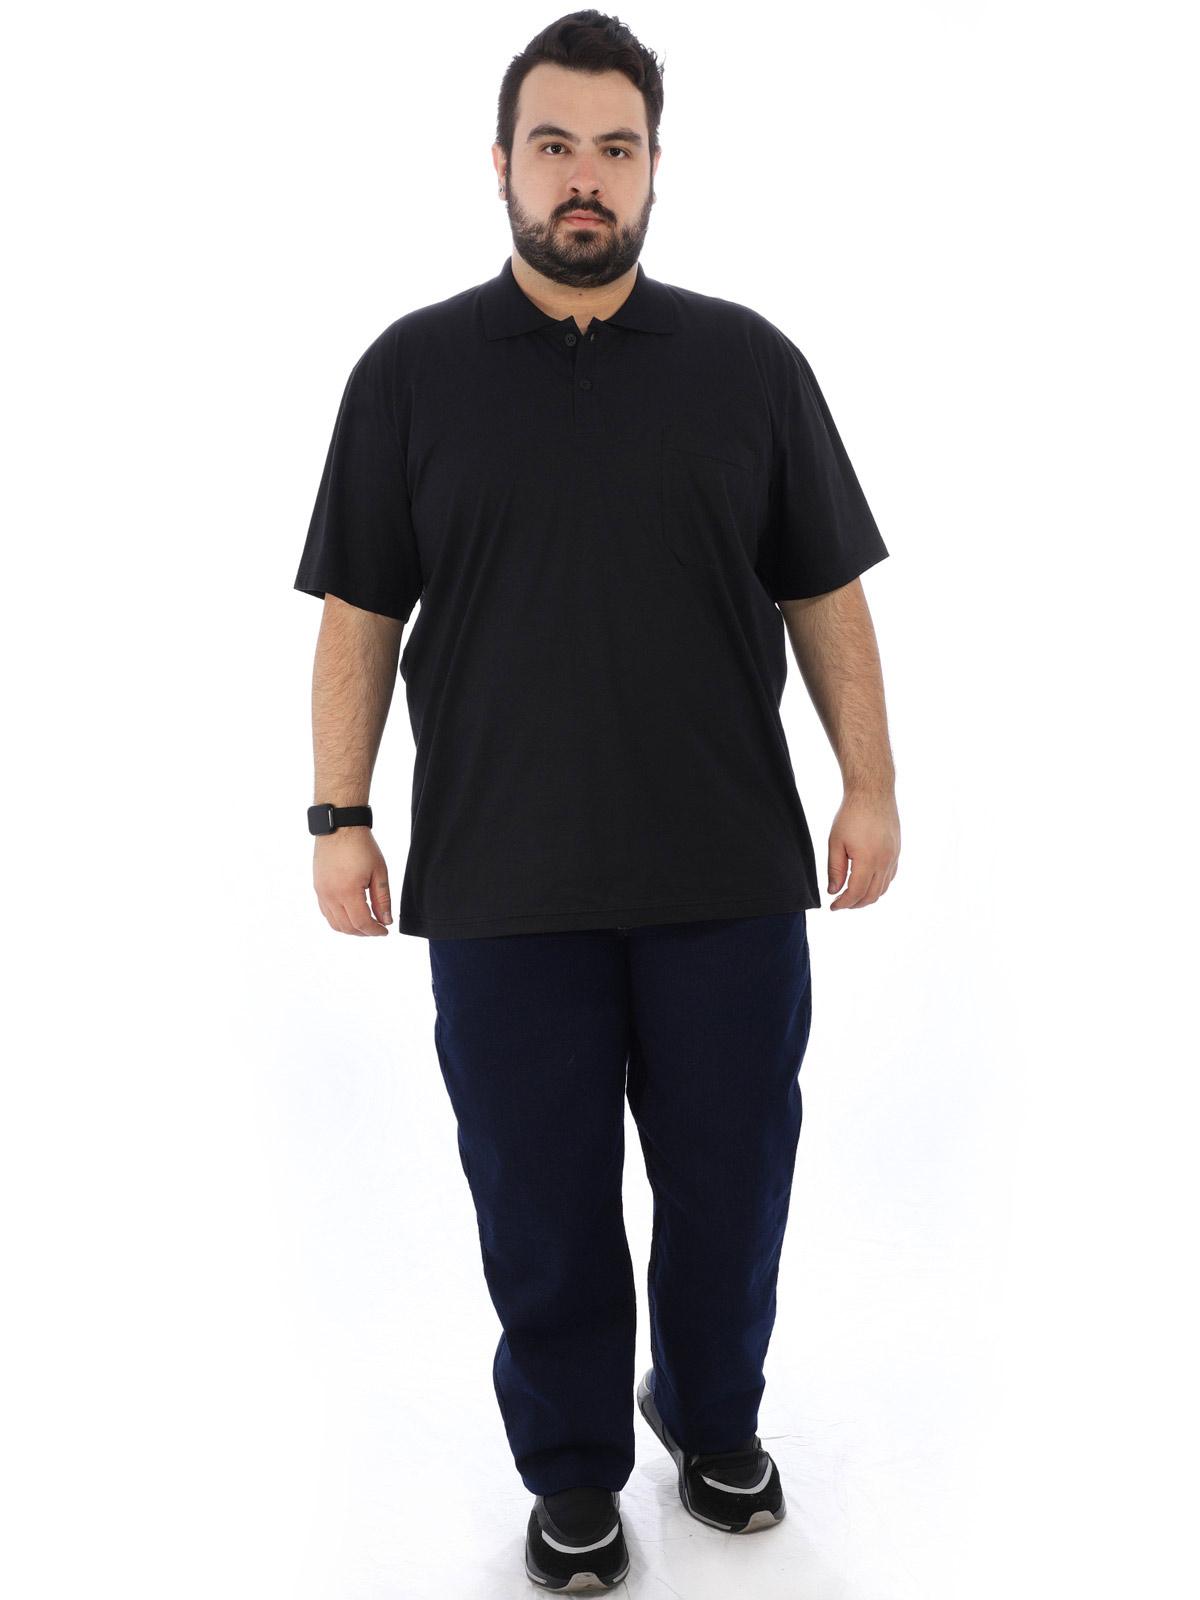 Camisa Polo Plus Size Masculina com Bolso Basica Preta